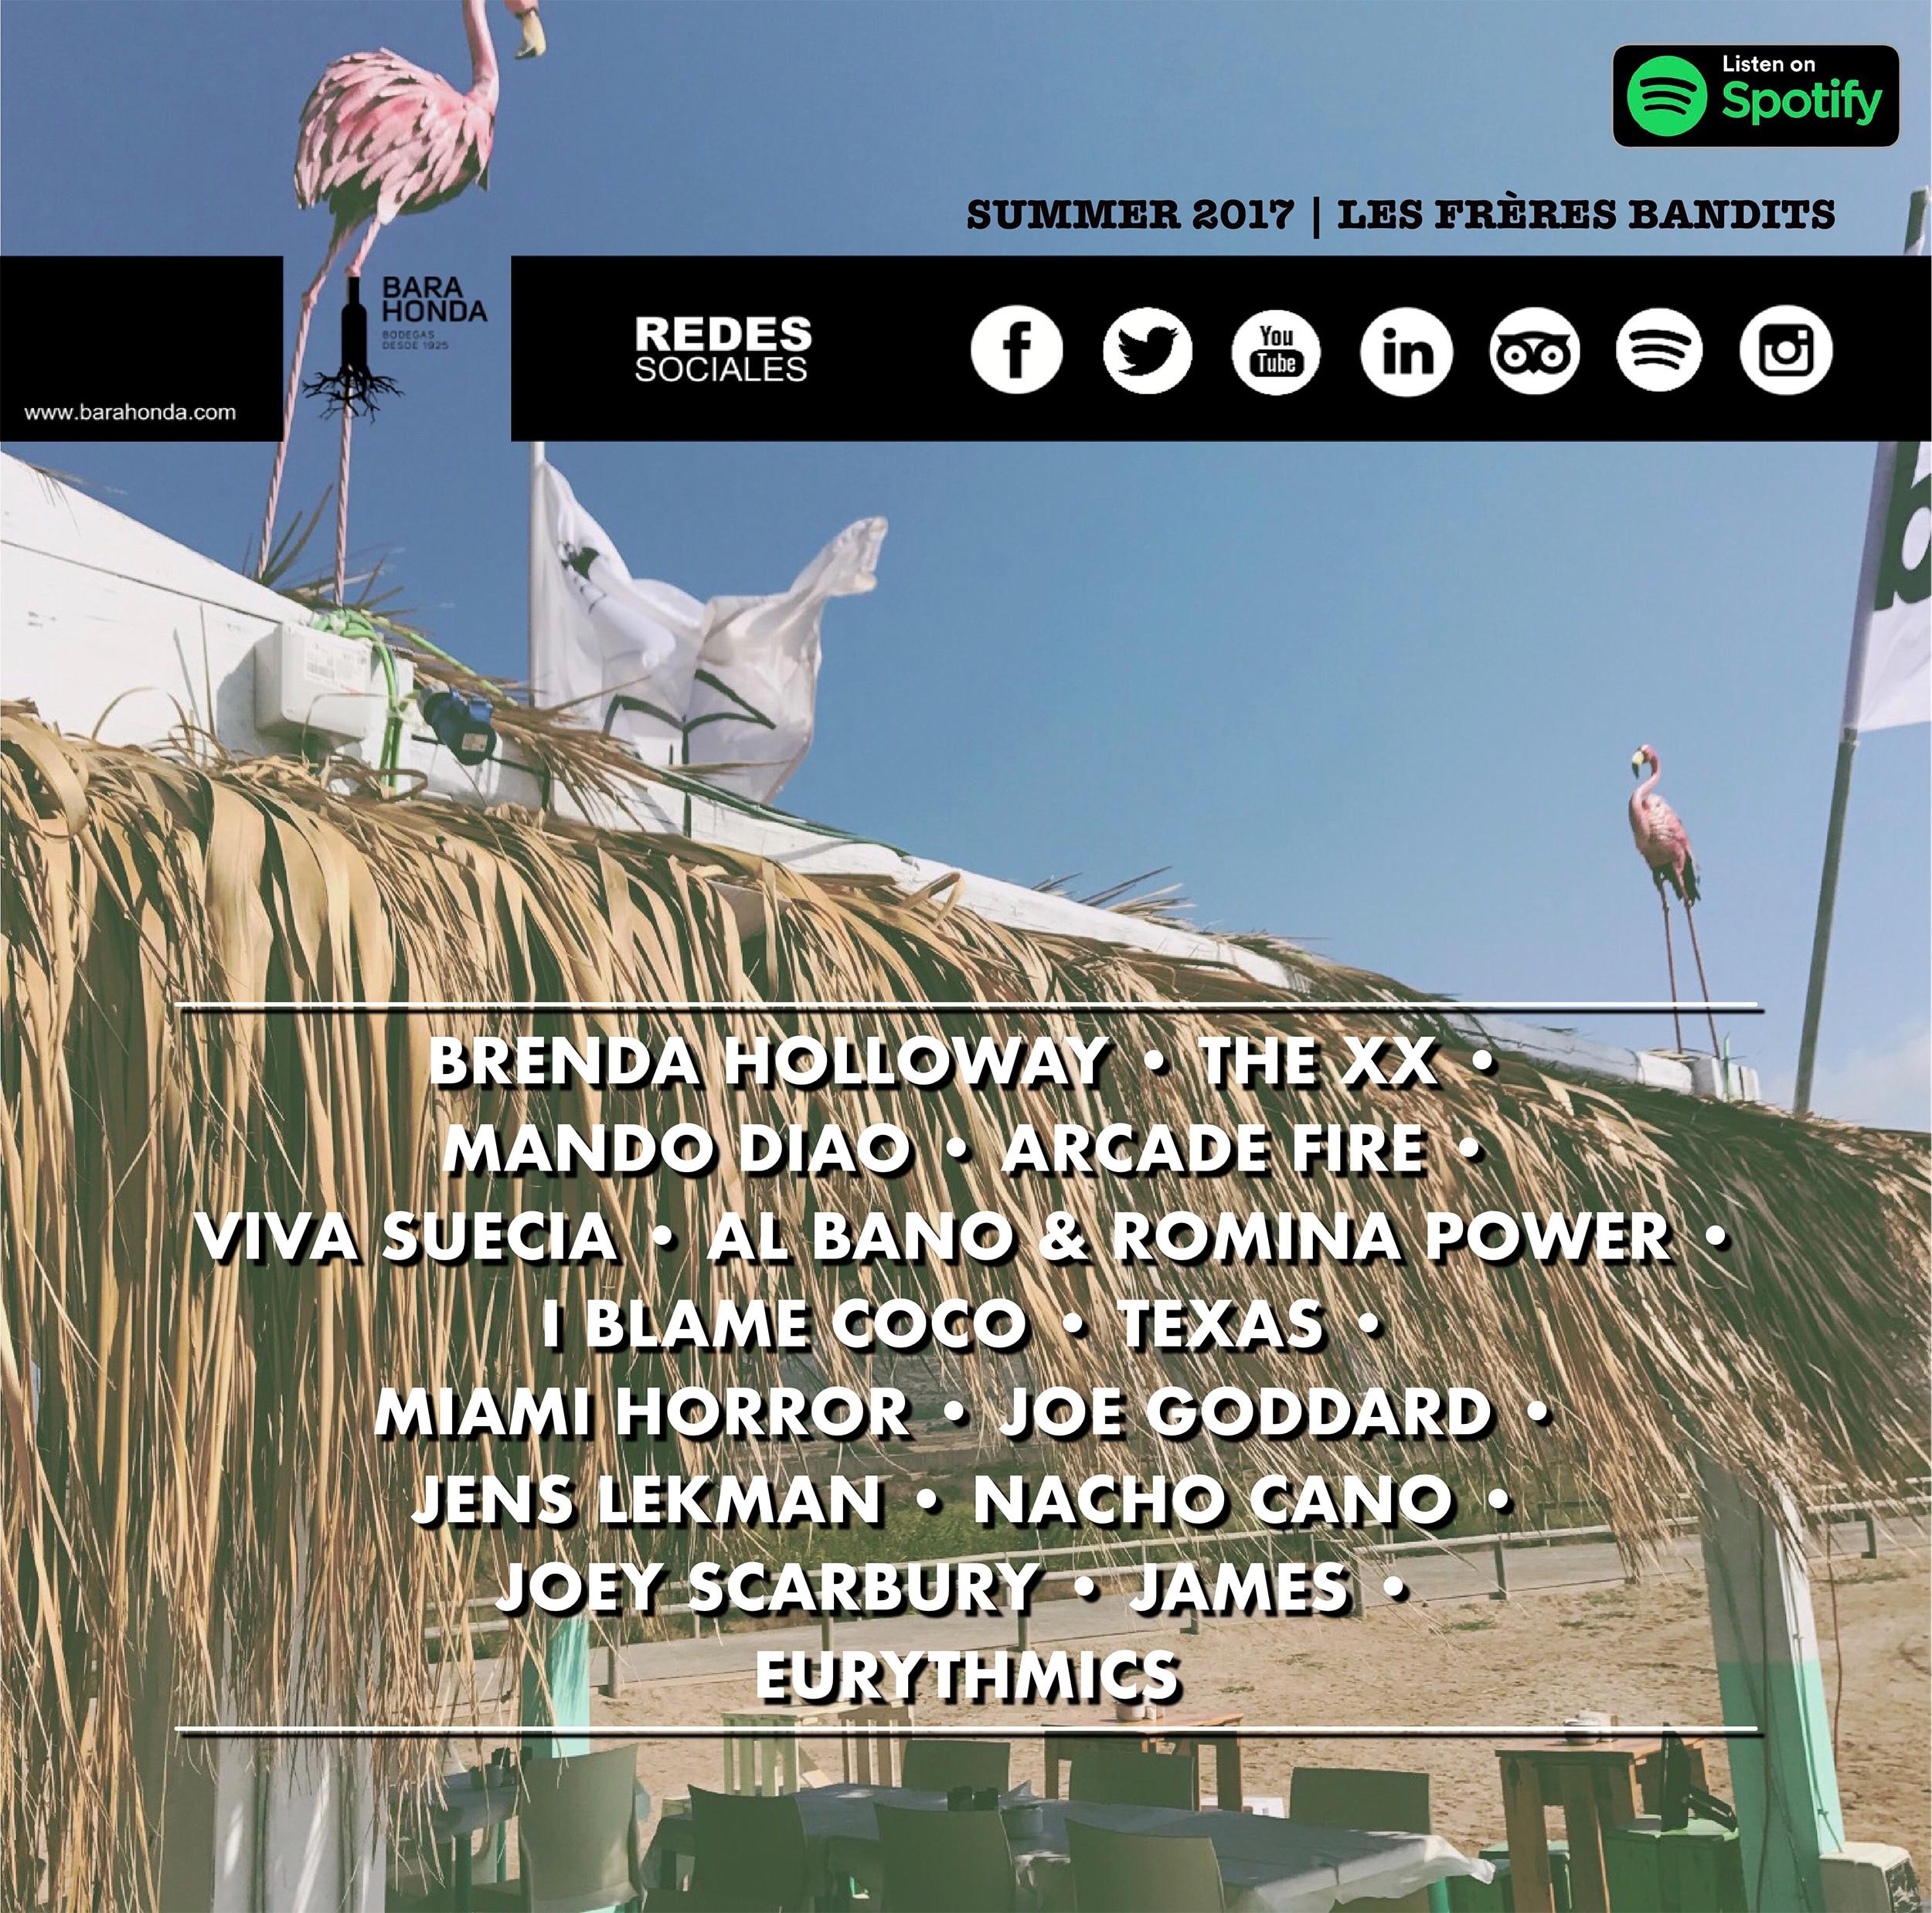 Playlist Spotify: Summer 2017 | Le frères bandits